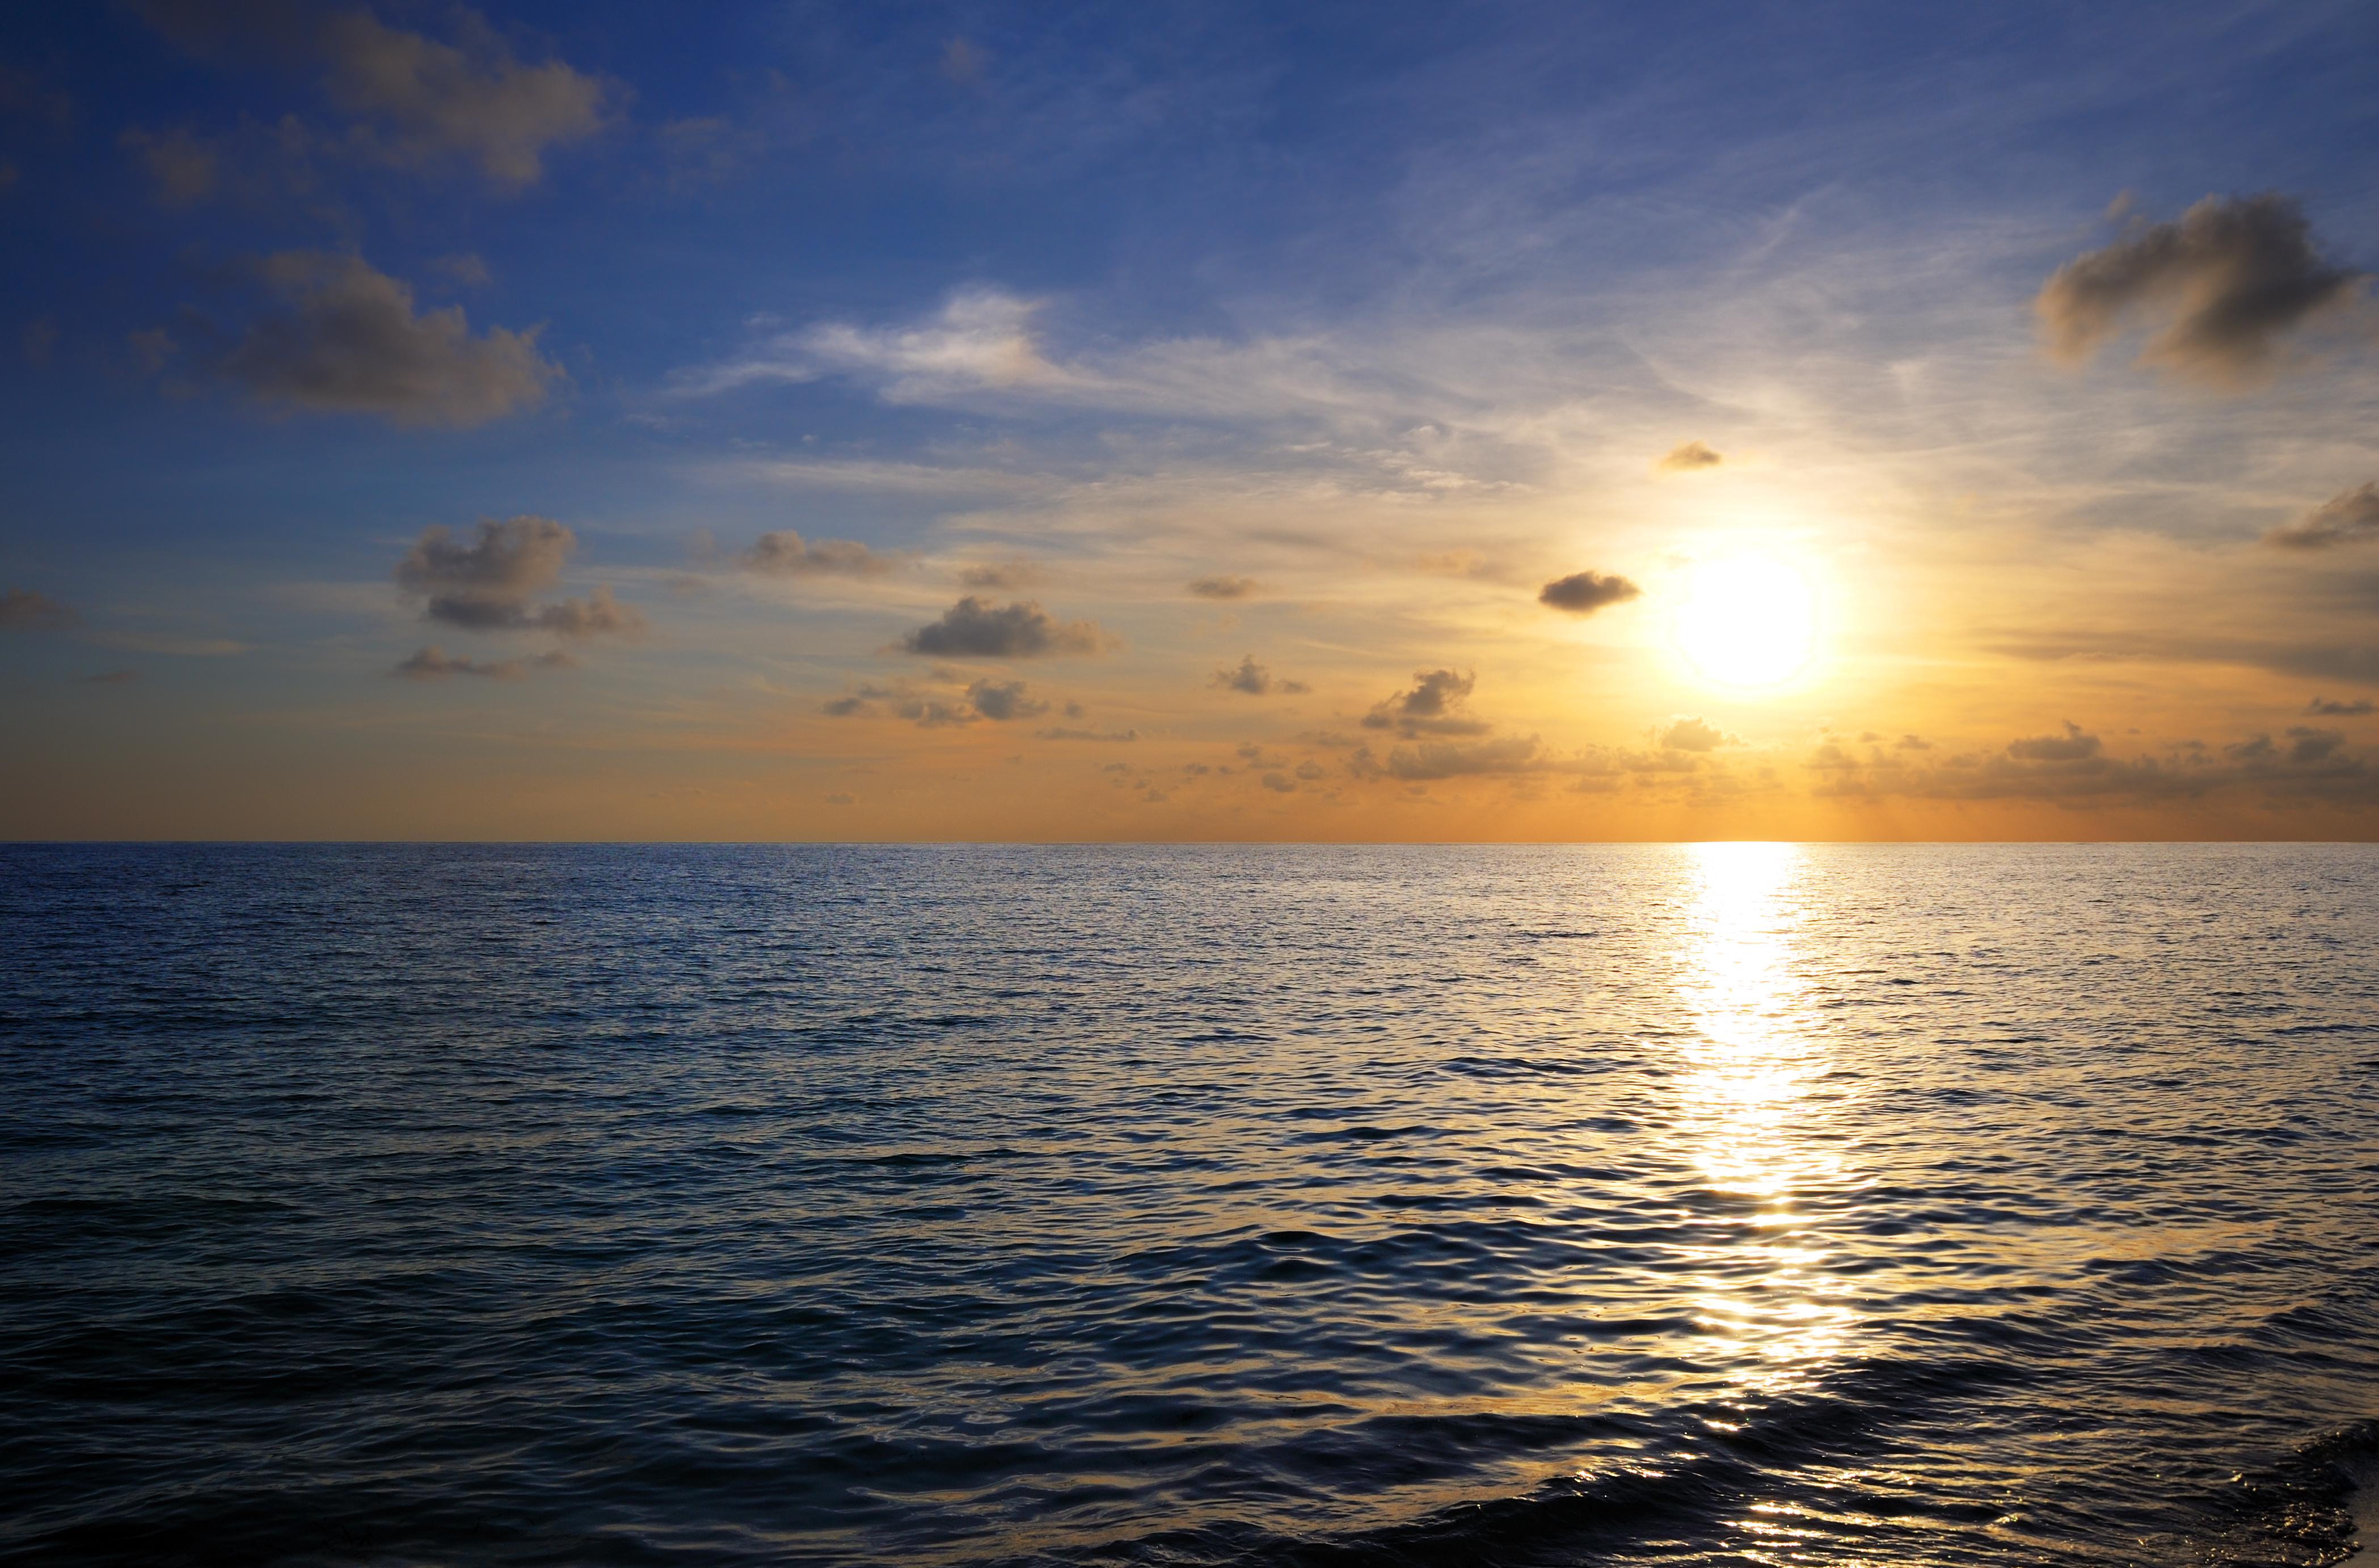 Evening cruise SPI South Pade Island